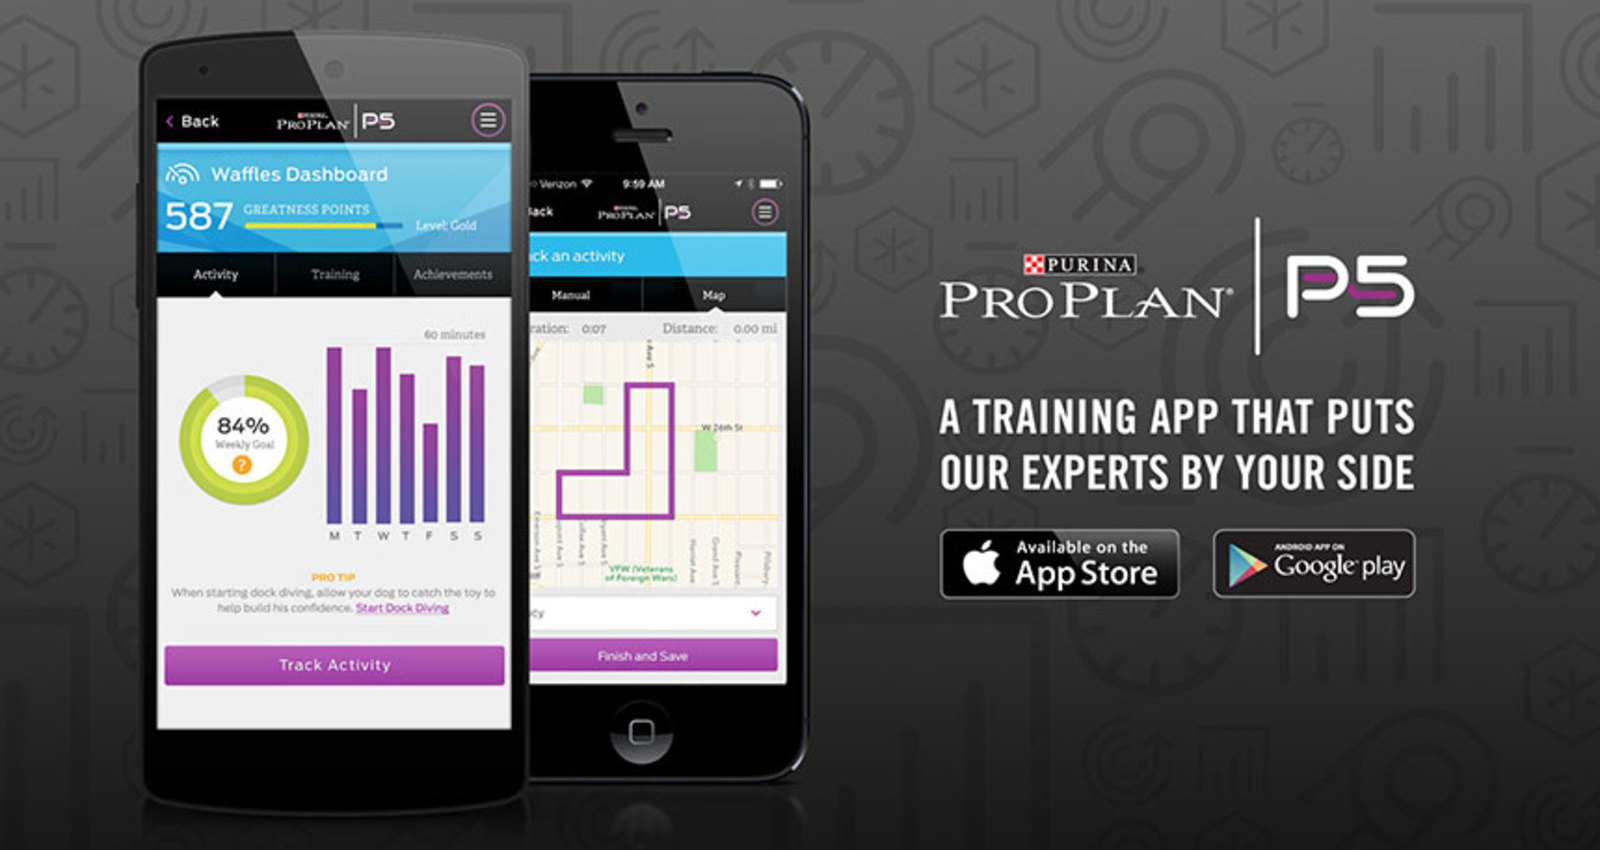 Purina Pro Plan P5 Dog Training App